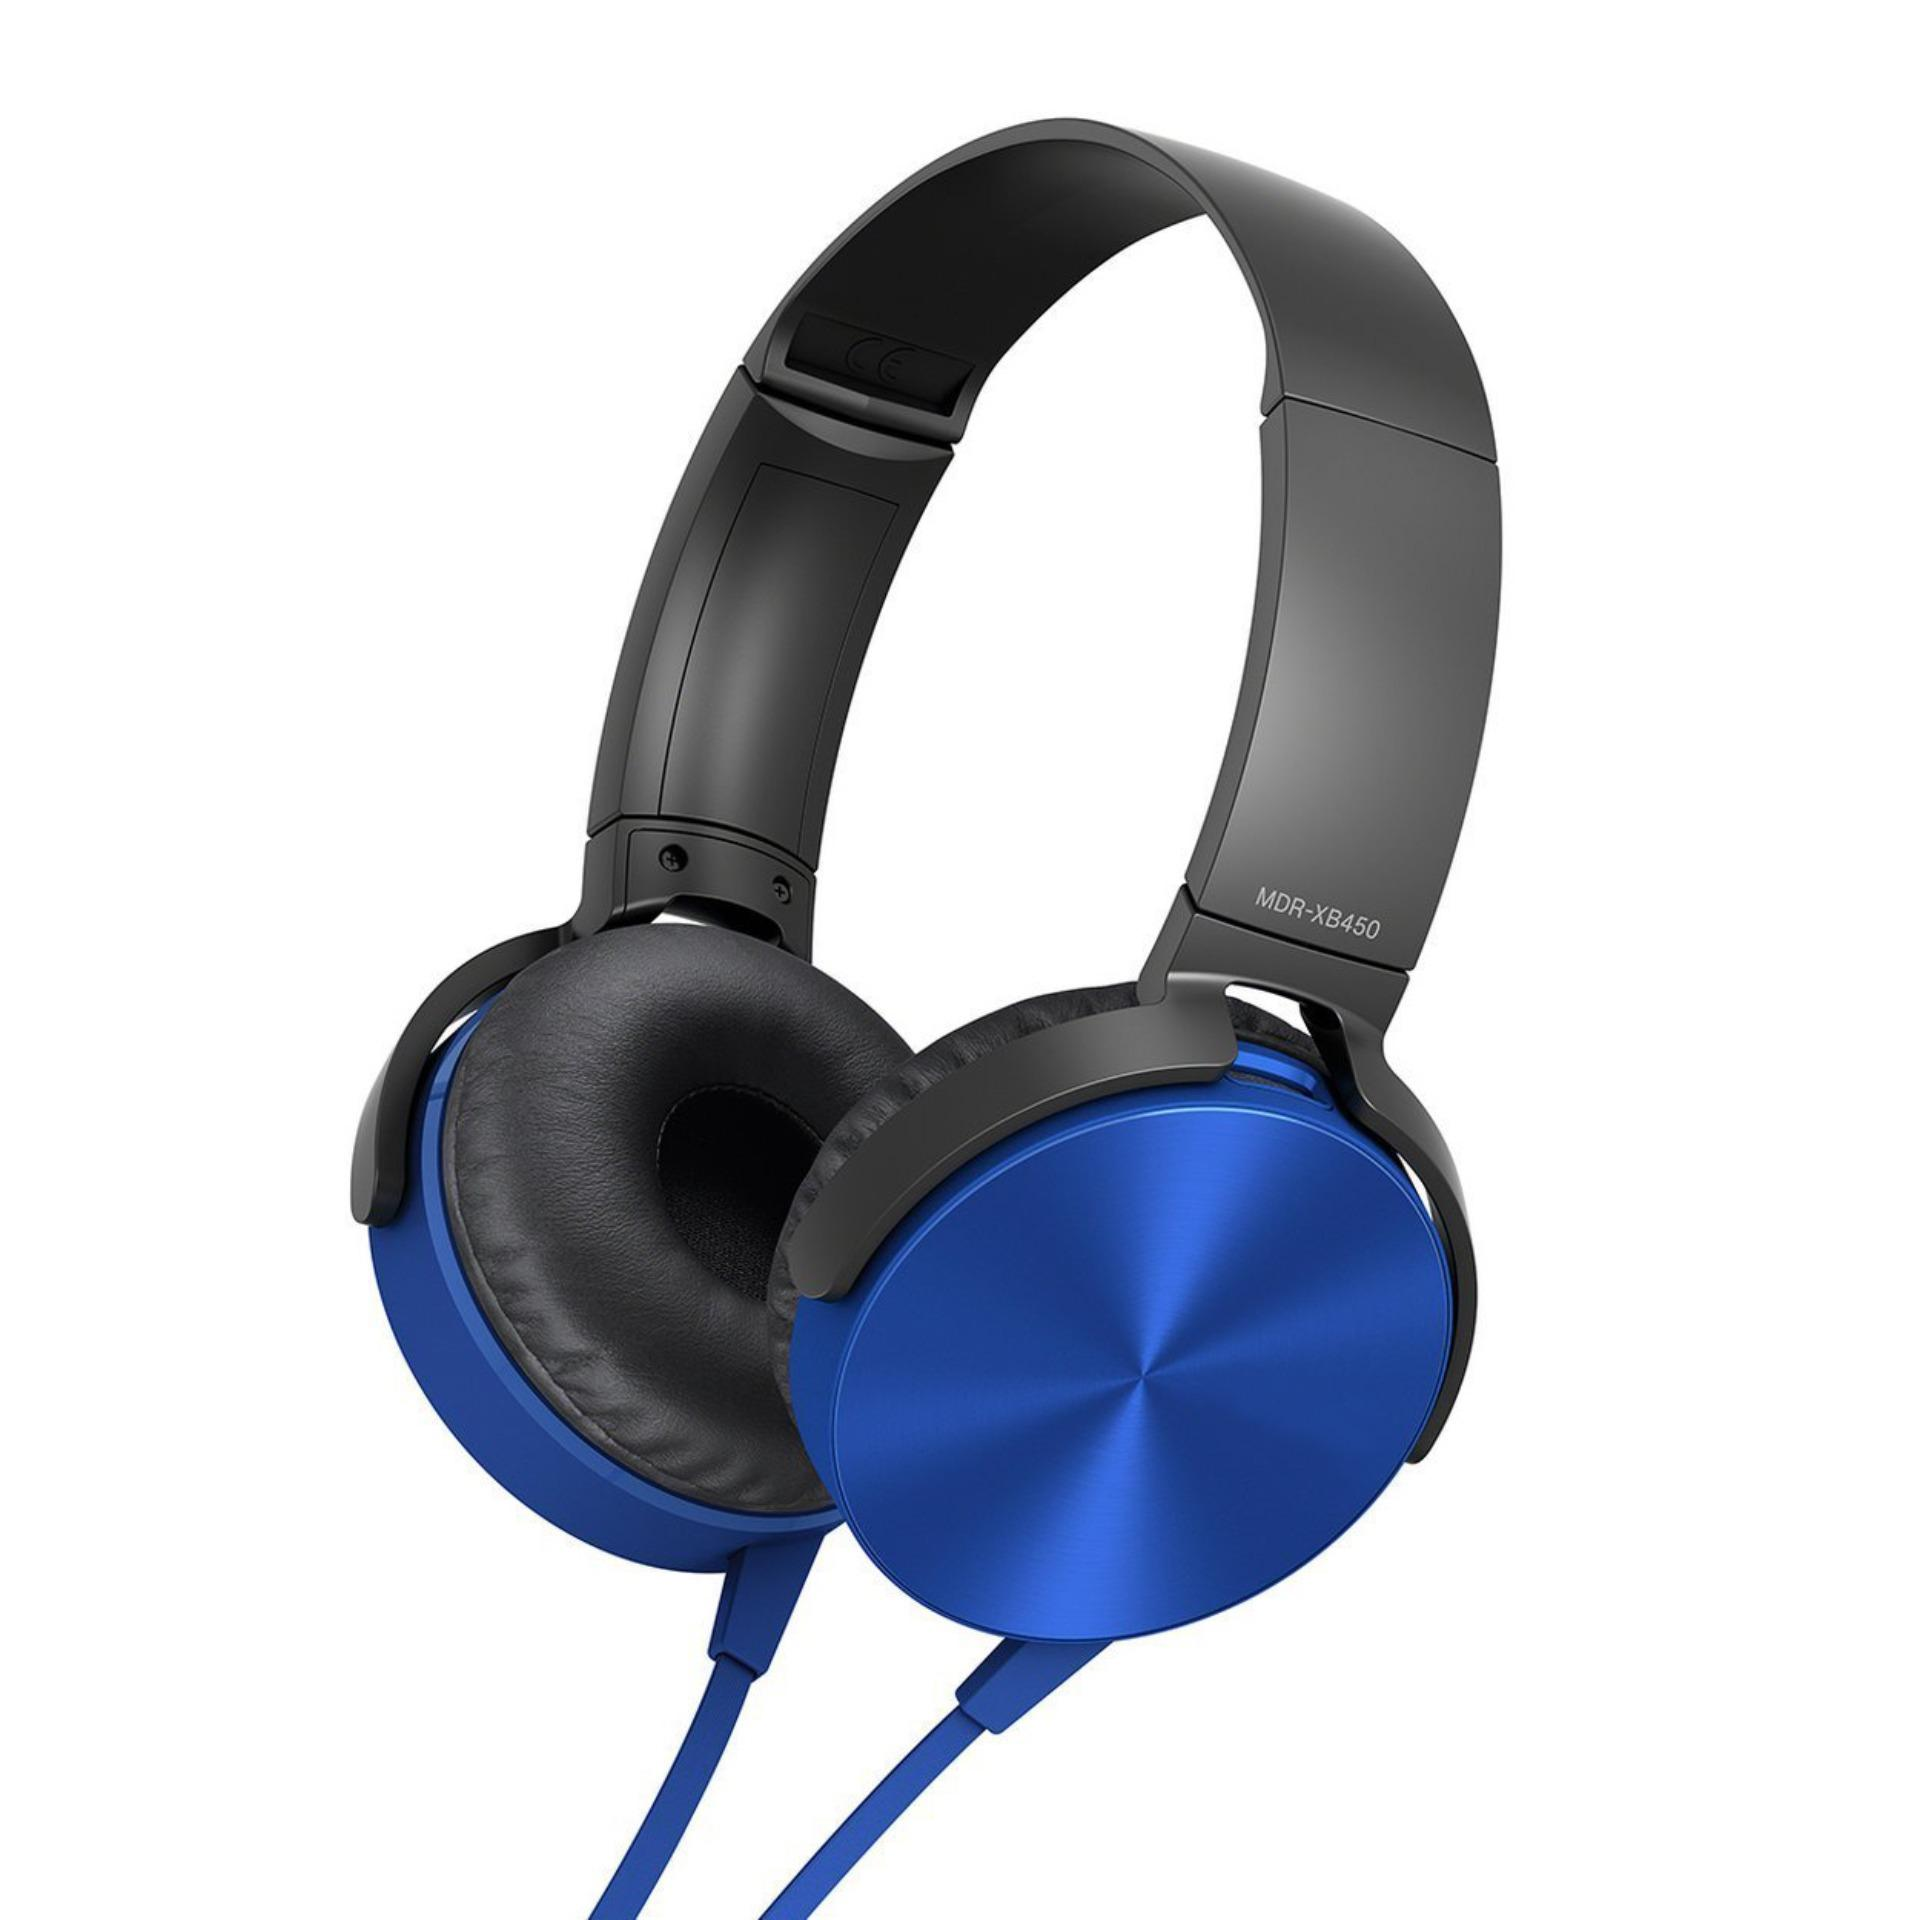 Toko Headphone Anugerah Headset Mdr Xb450Ap Online